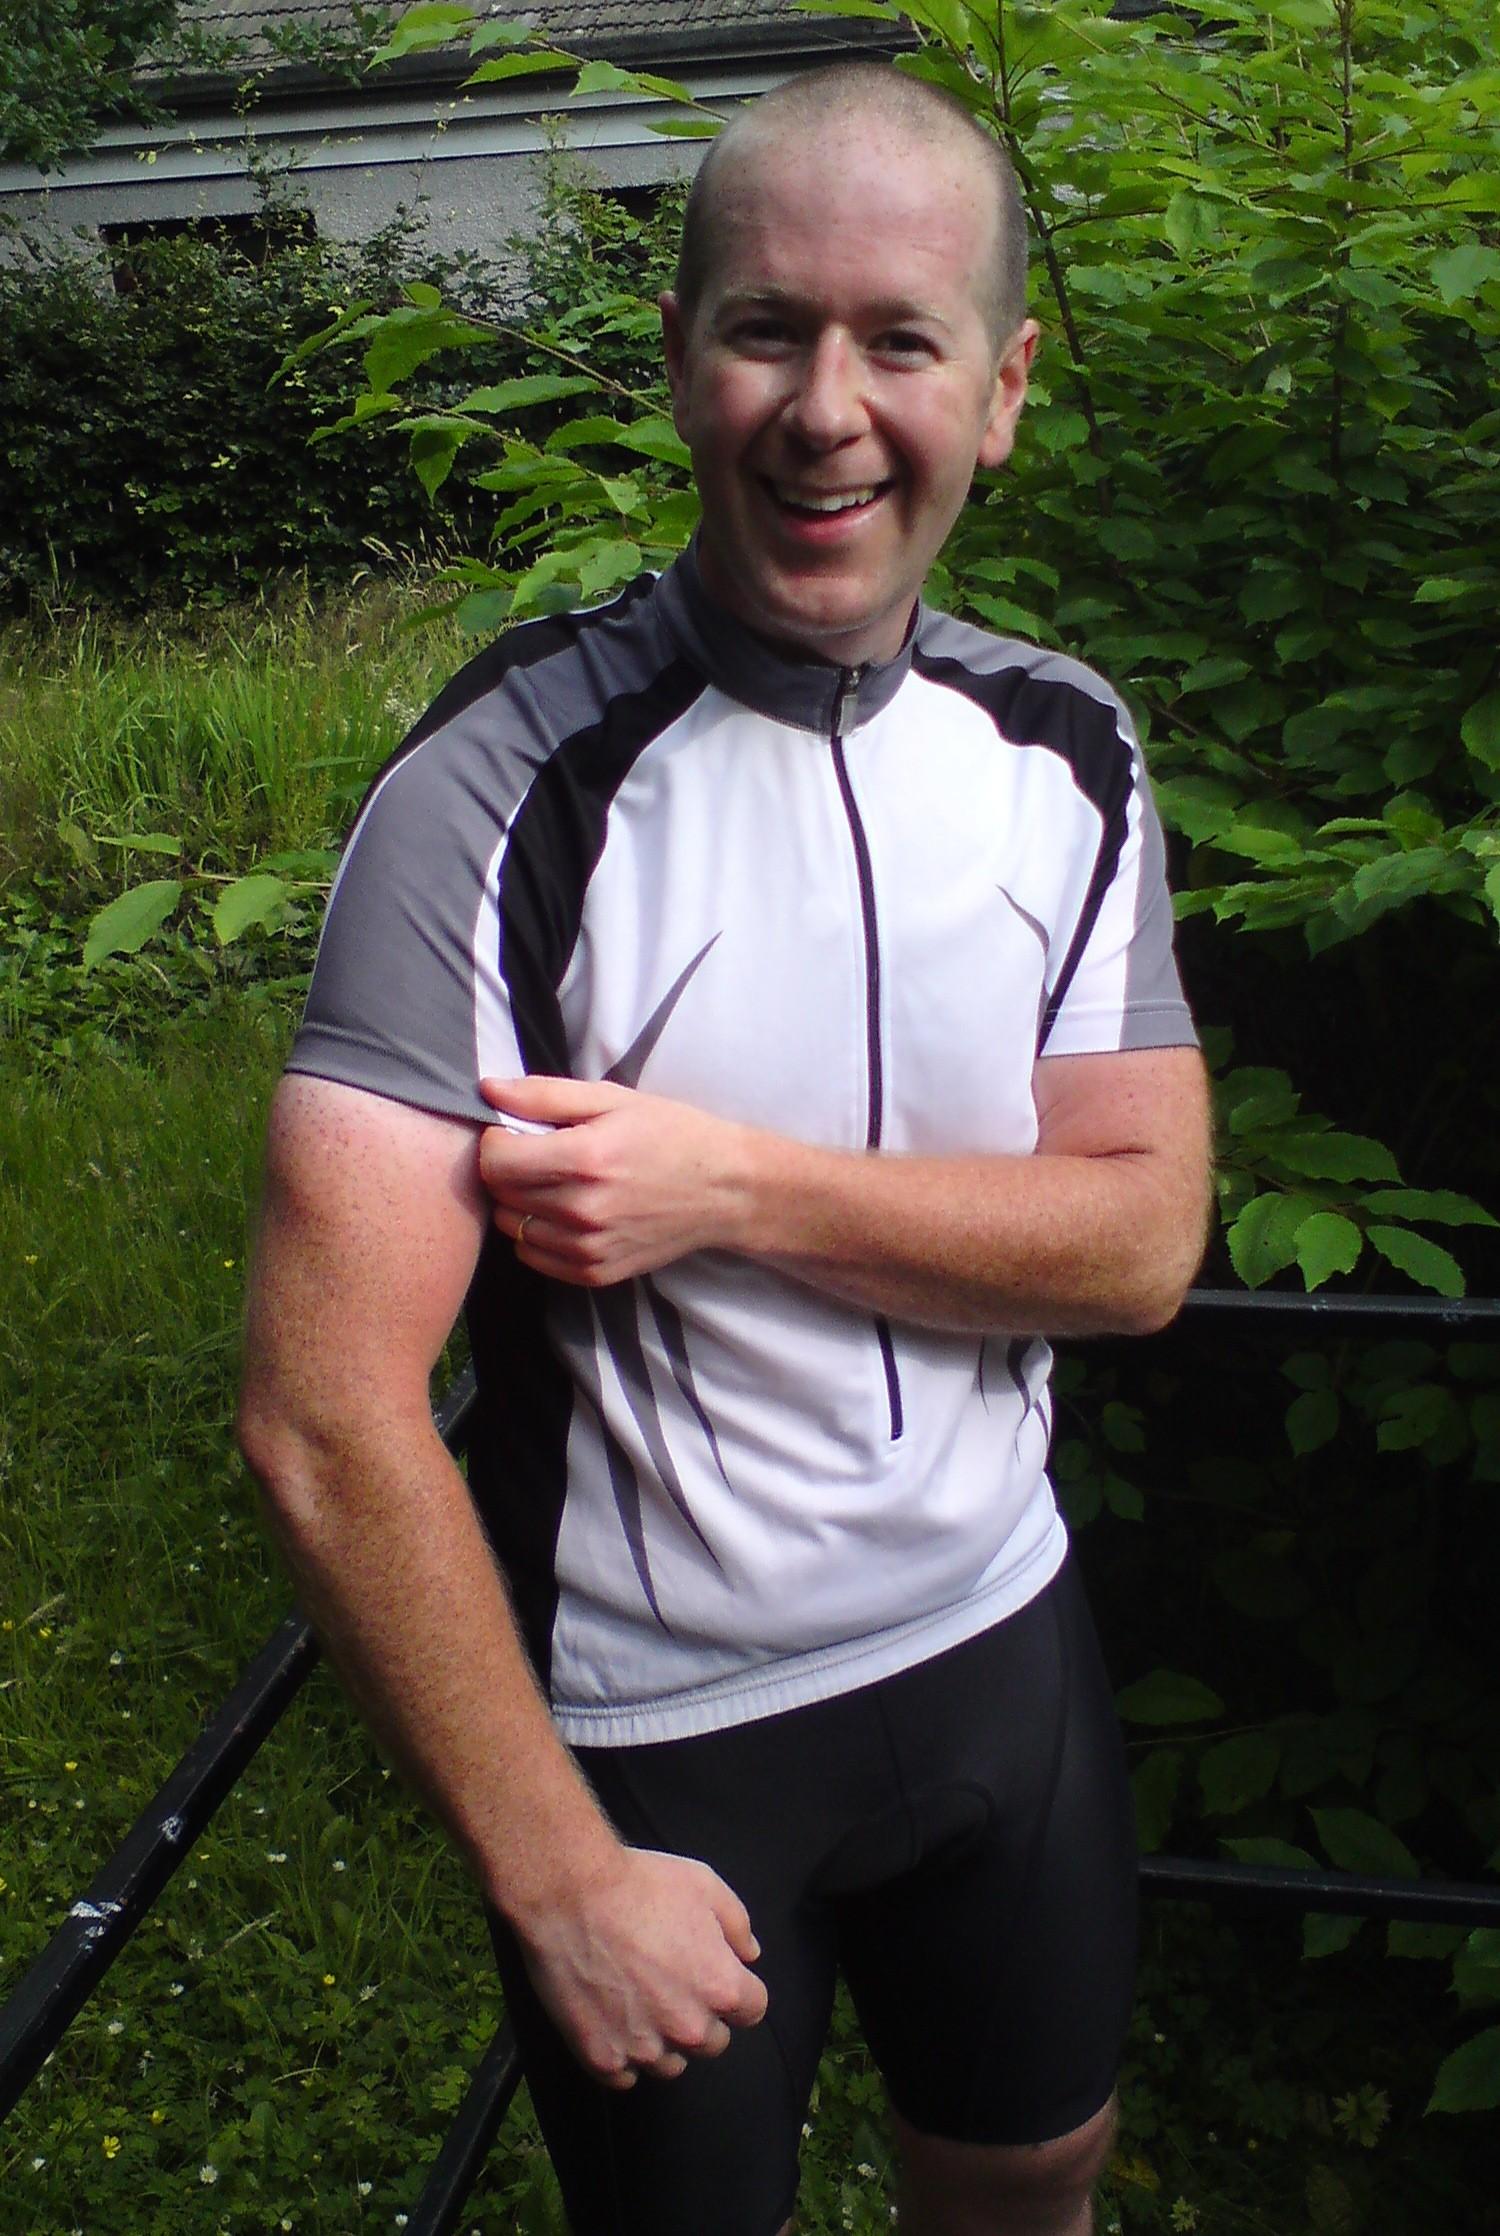 Sam shows off his cyclist's tan!